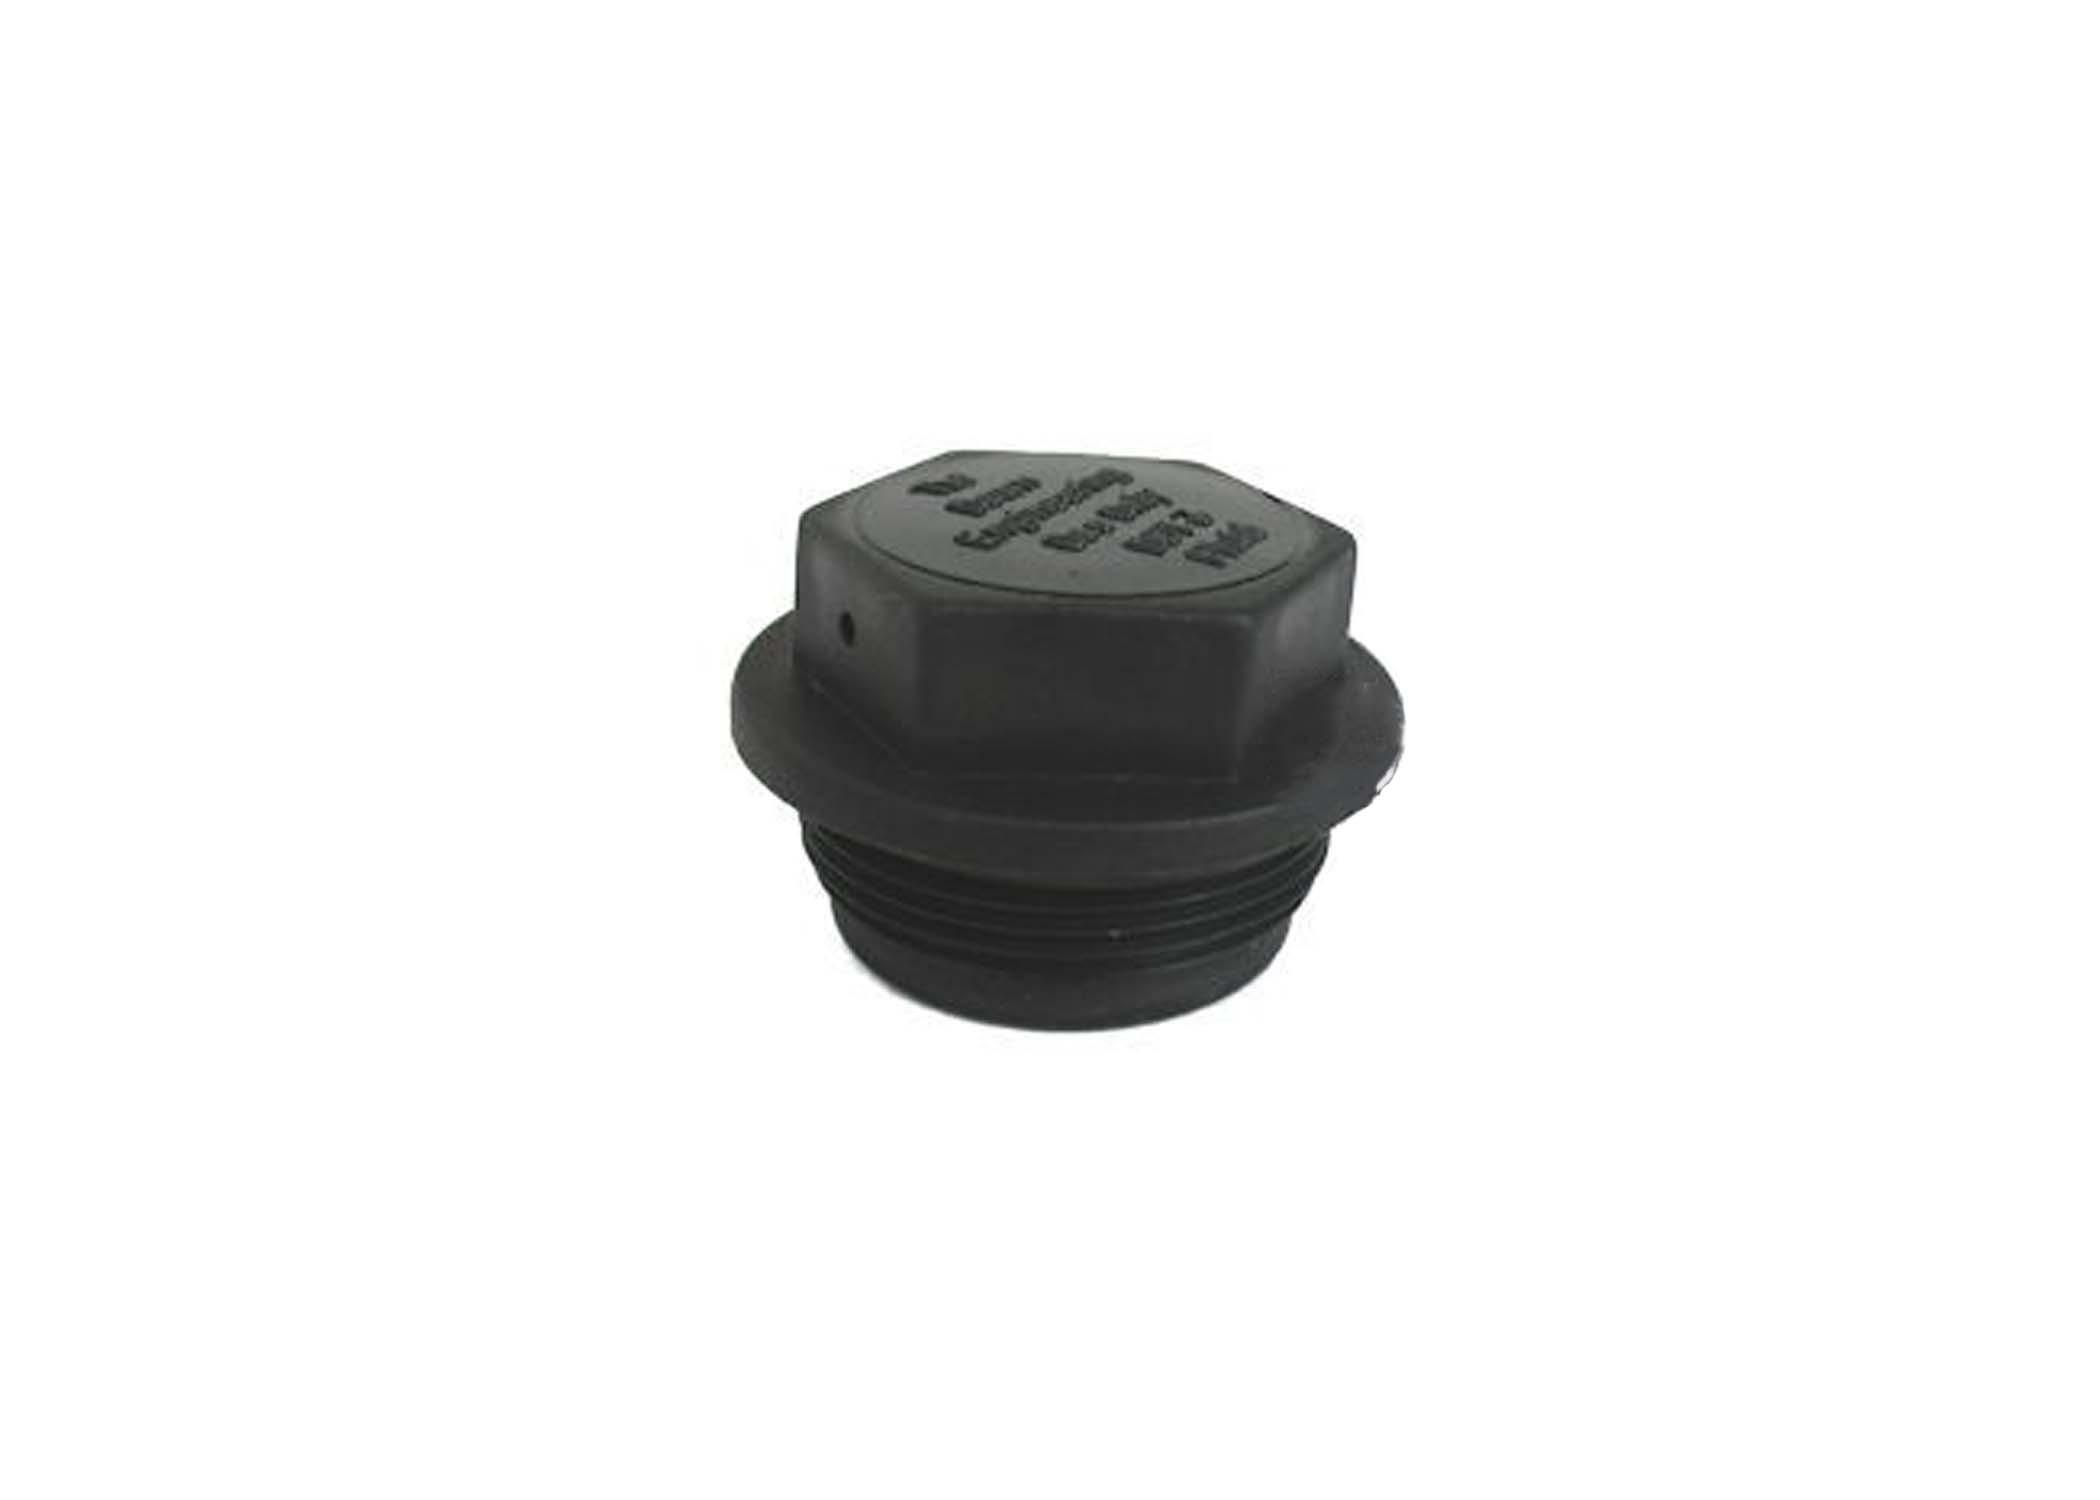 pump down solenoid wiring diagram tie down actuator wiring diagram master cylinder cap for tie down brake actuator ...